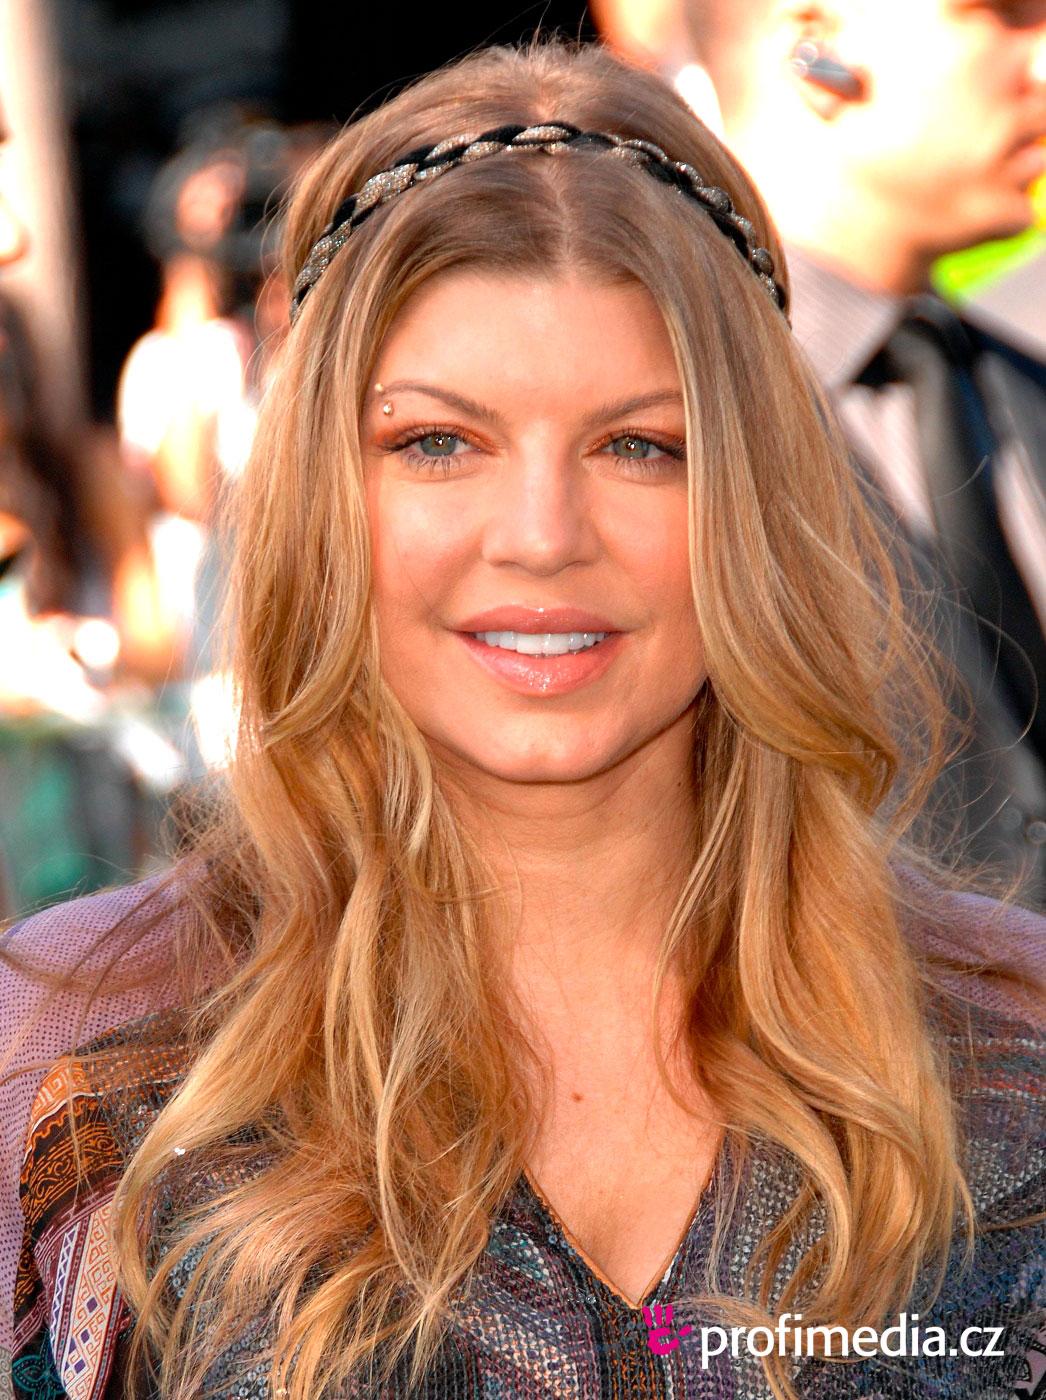 Fergie - - hairstyle - easyHairStyler Fergie